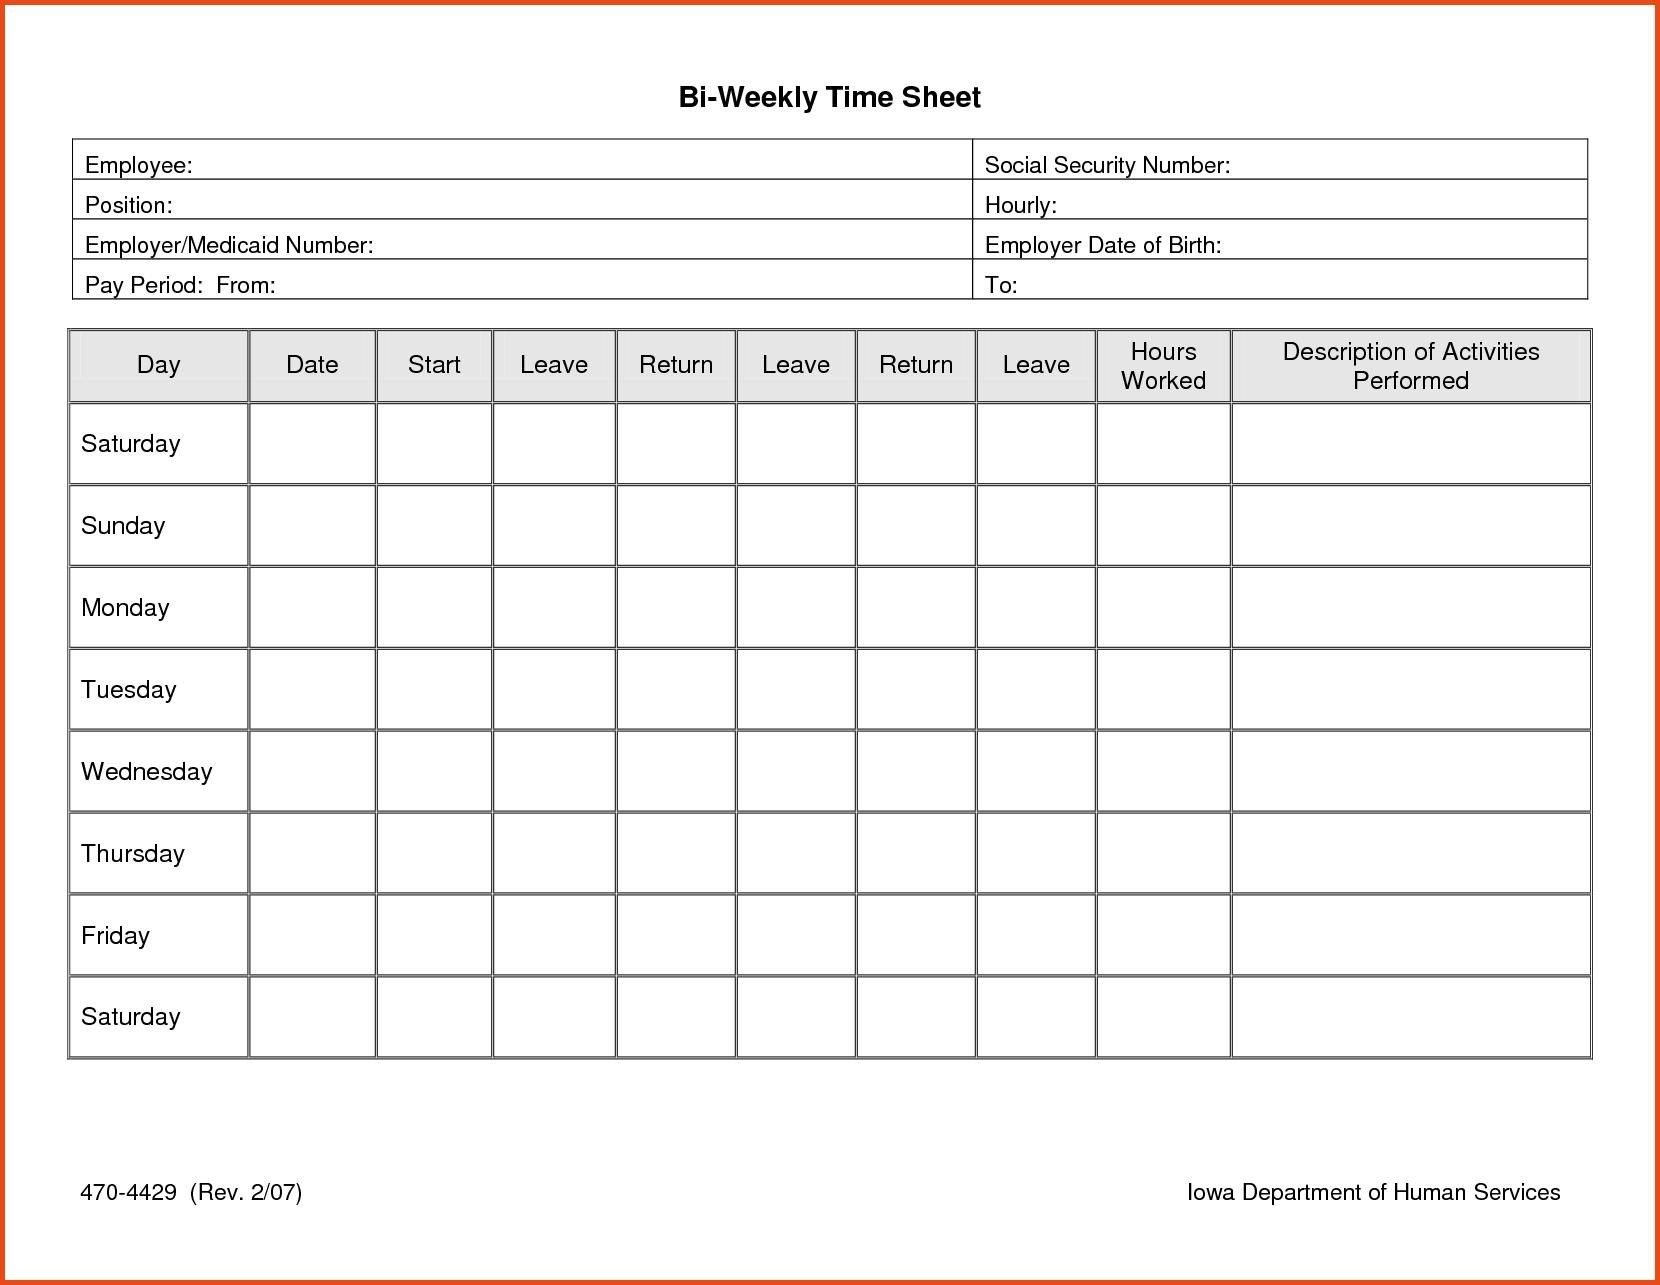 013 Time Sheet Templates Free Daily Timesheet Template Printable - Free Printable Weekly Time Sheets